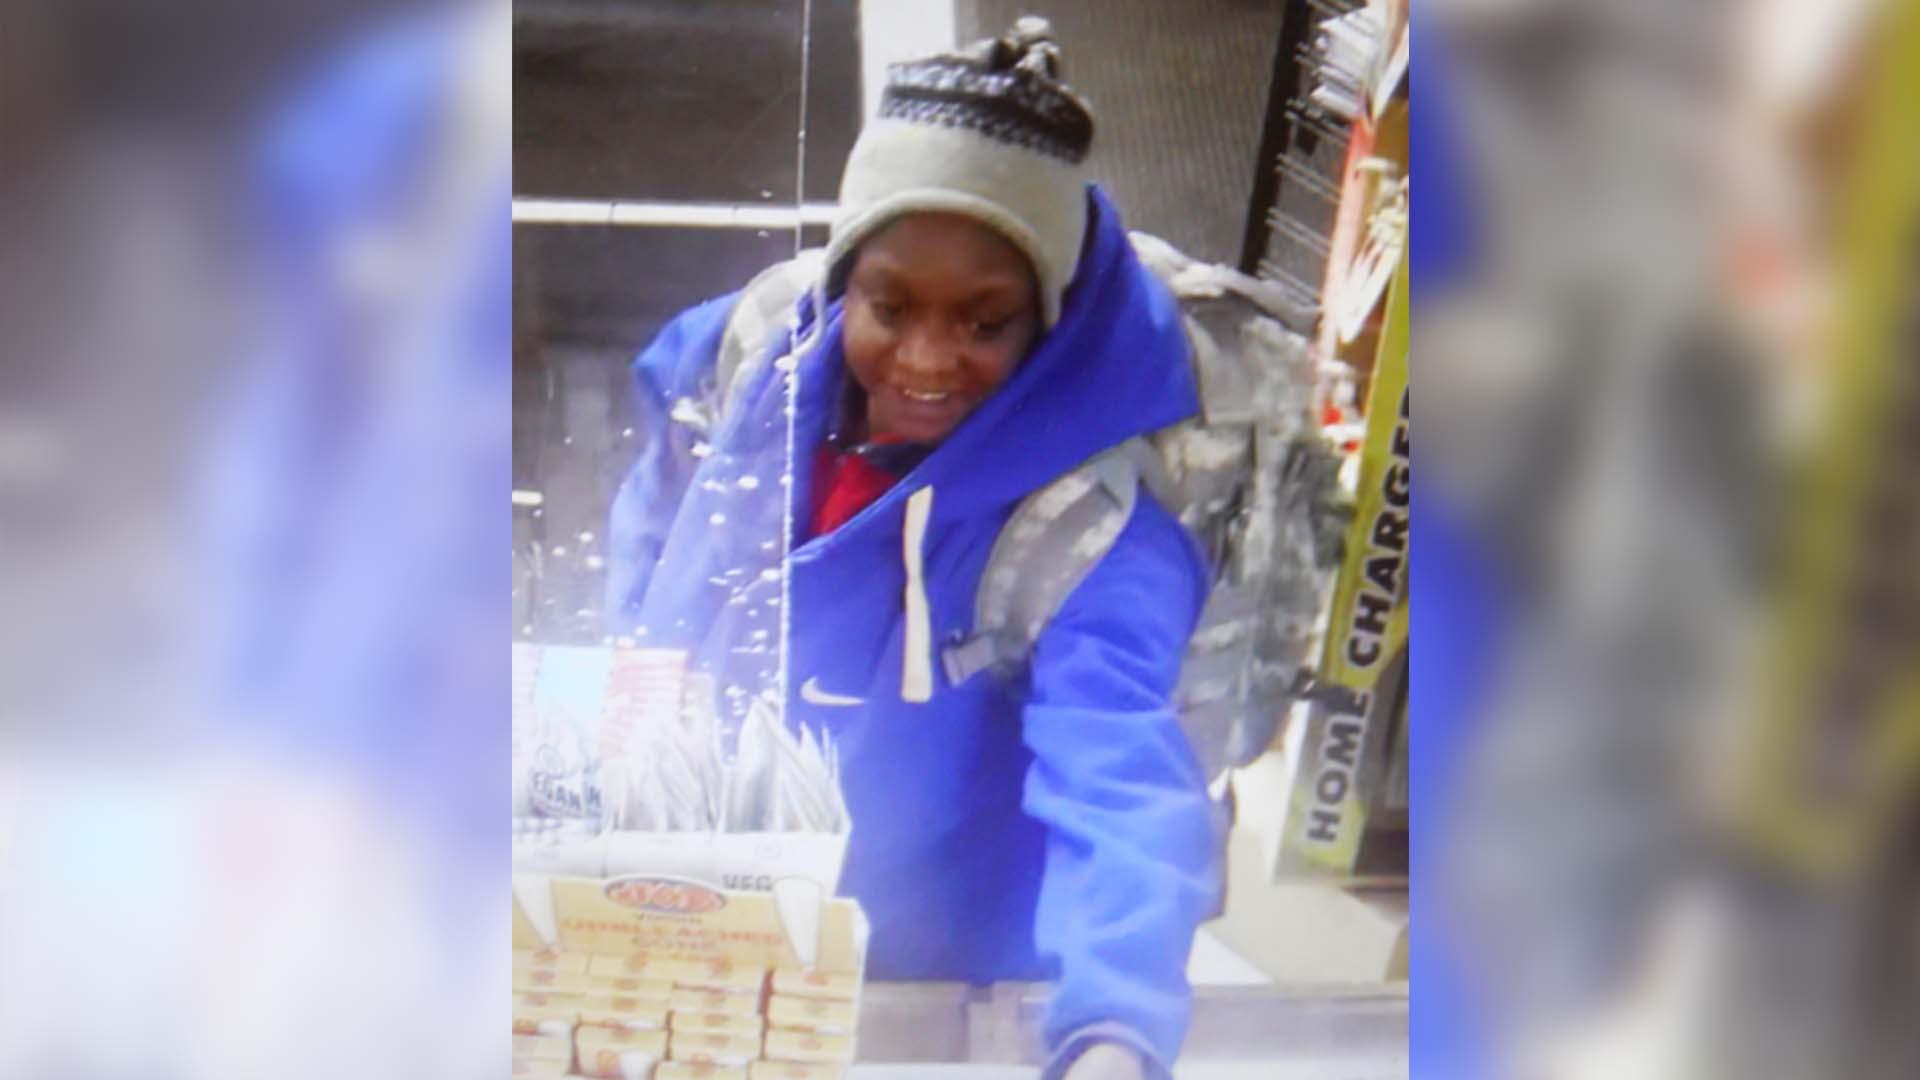 2-20 Dayton Knife Robbery Suspect